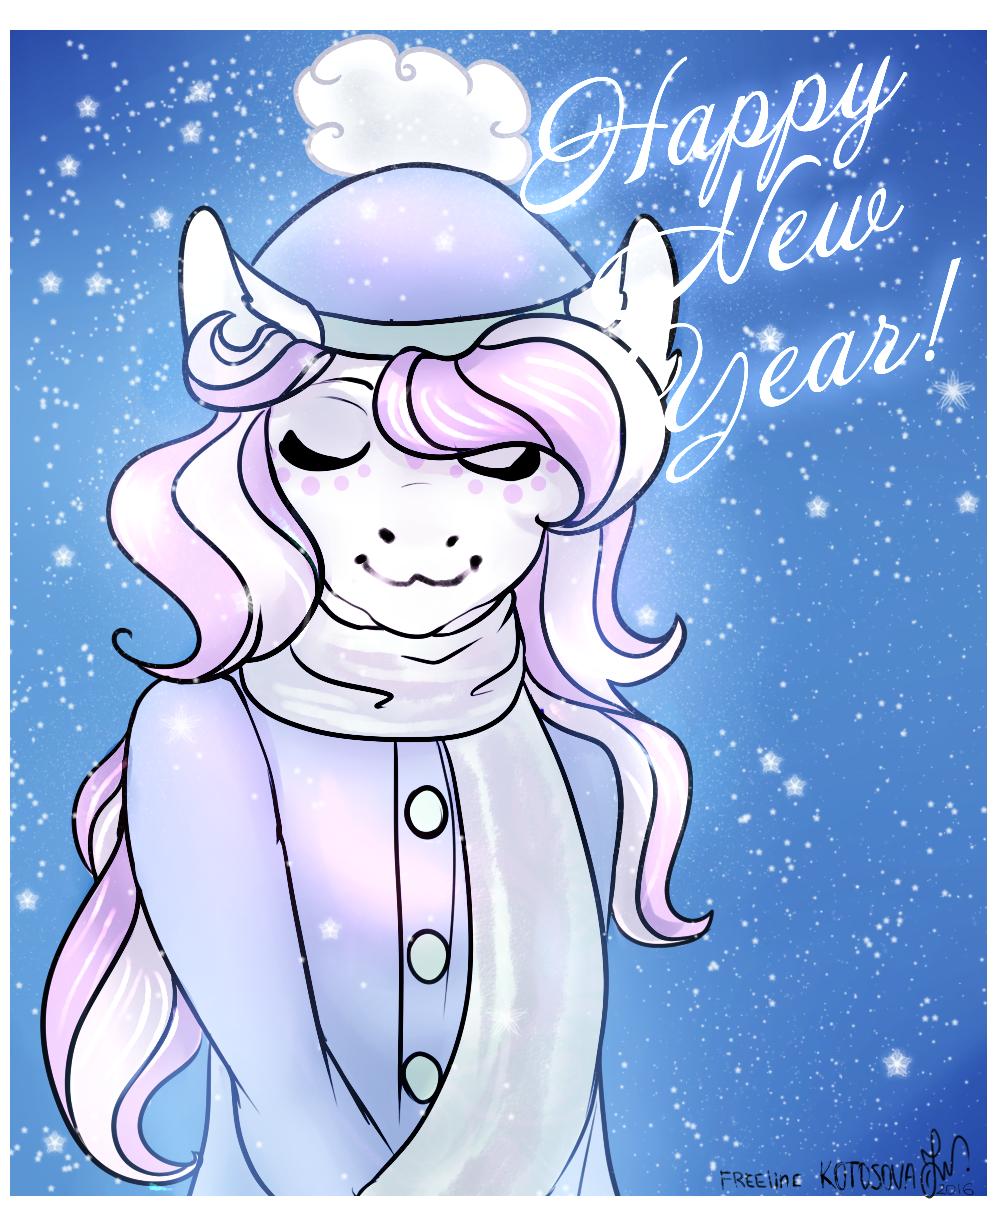 Happy New Year by zombiegoddess666